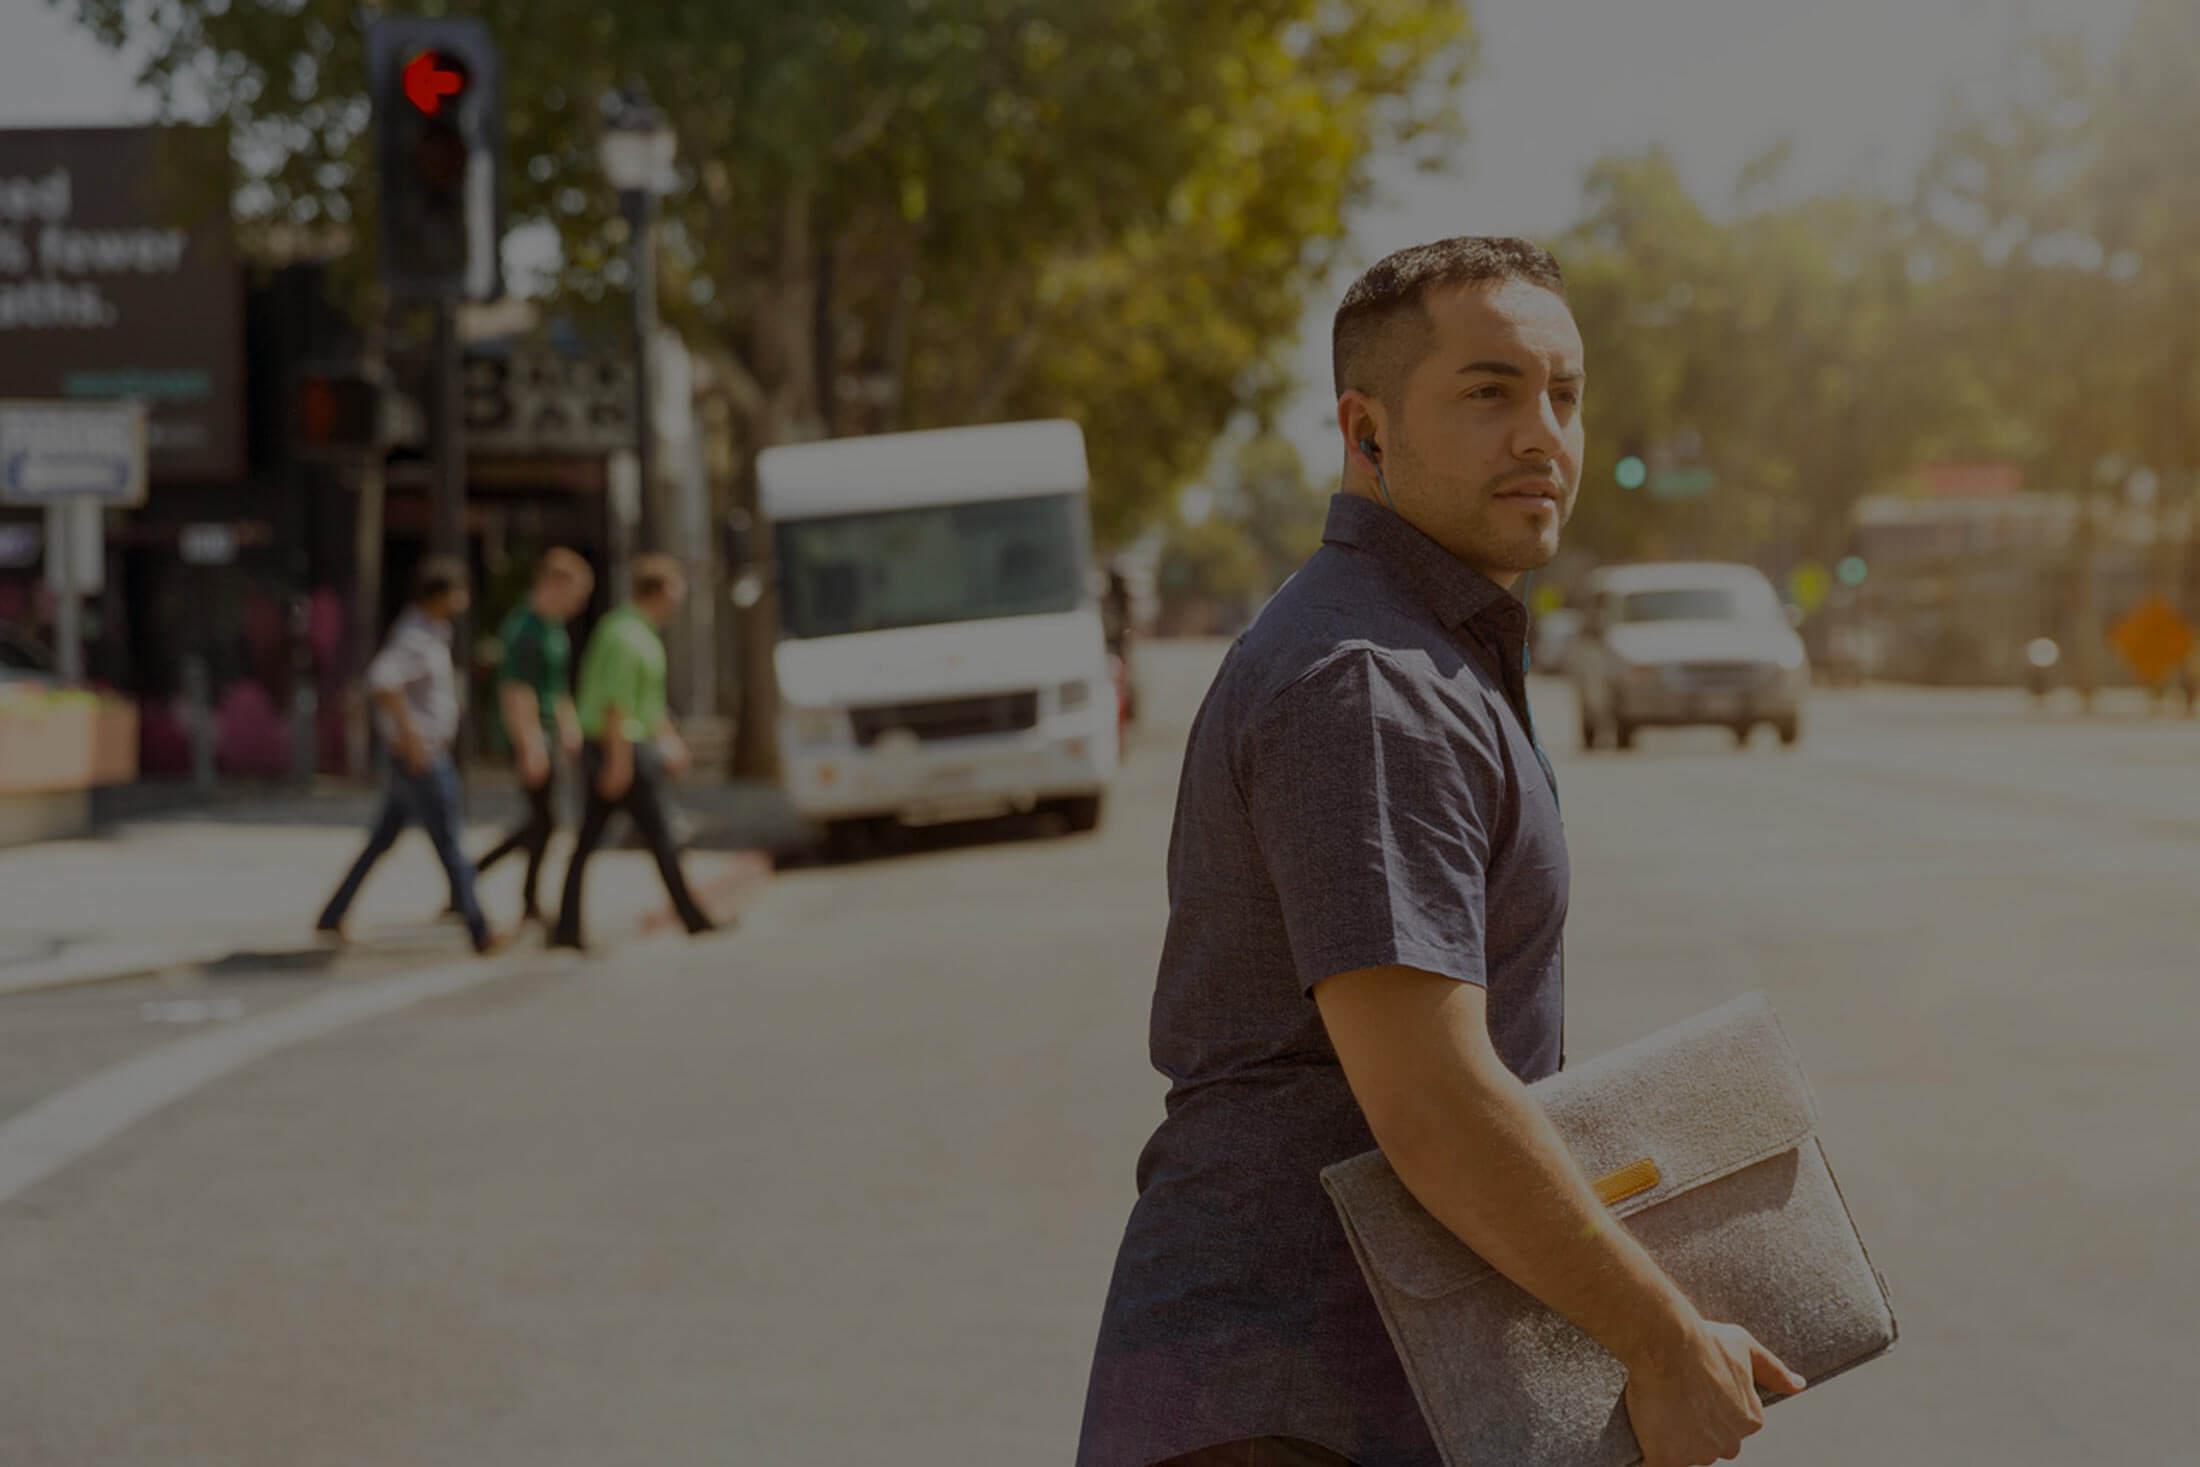 Pole emploi - offre emploi Operateur tariere en formation (H/F) - Pessac